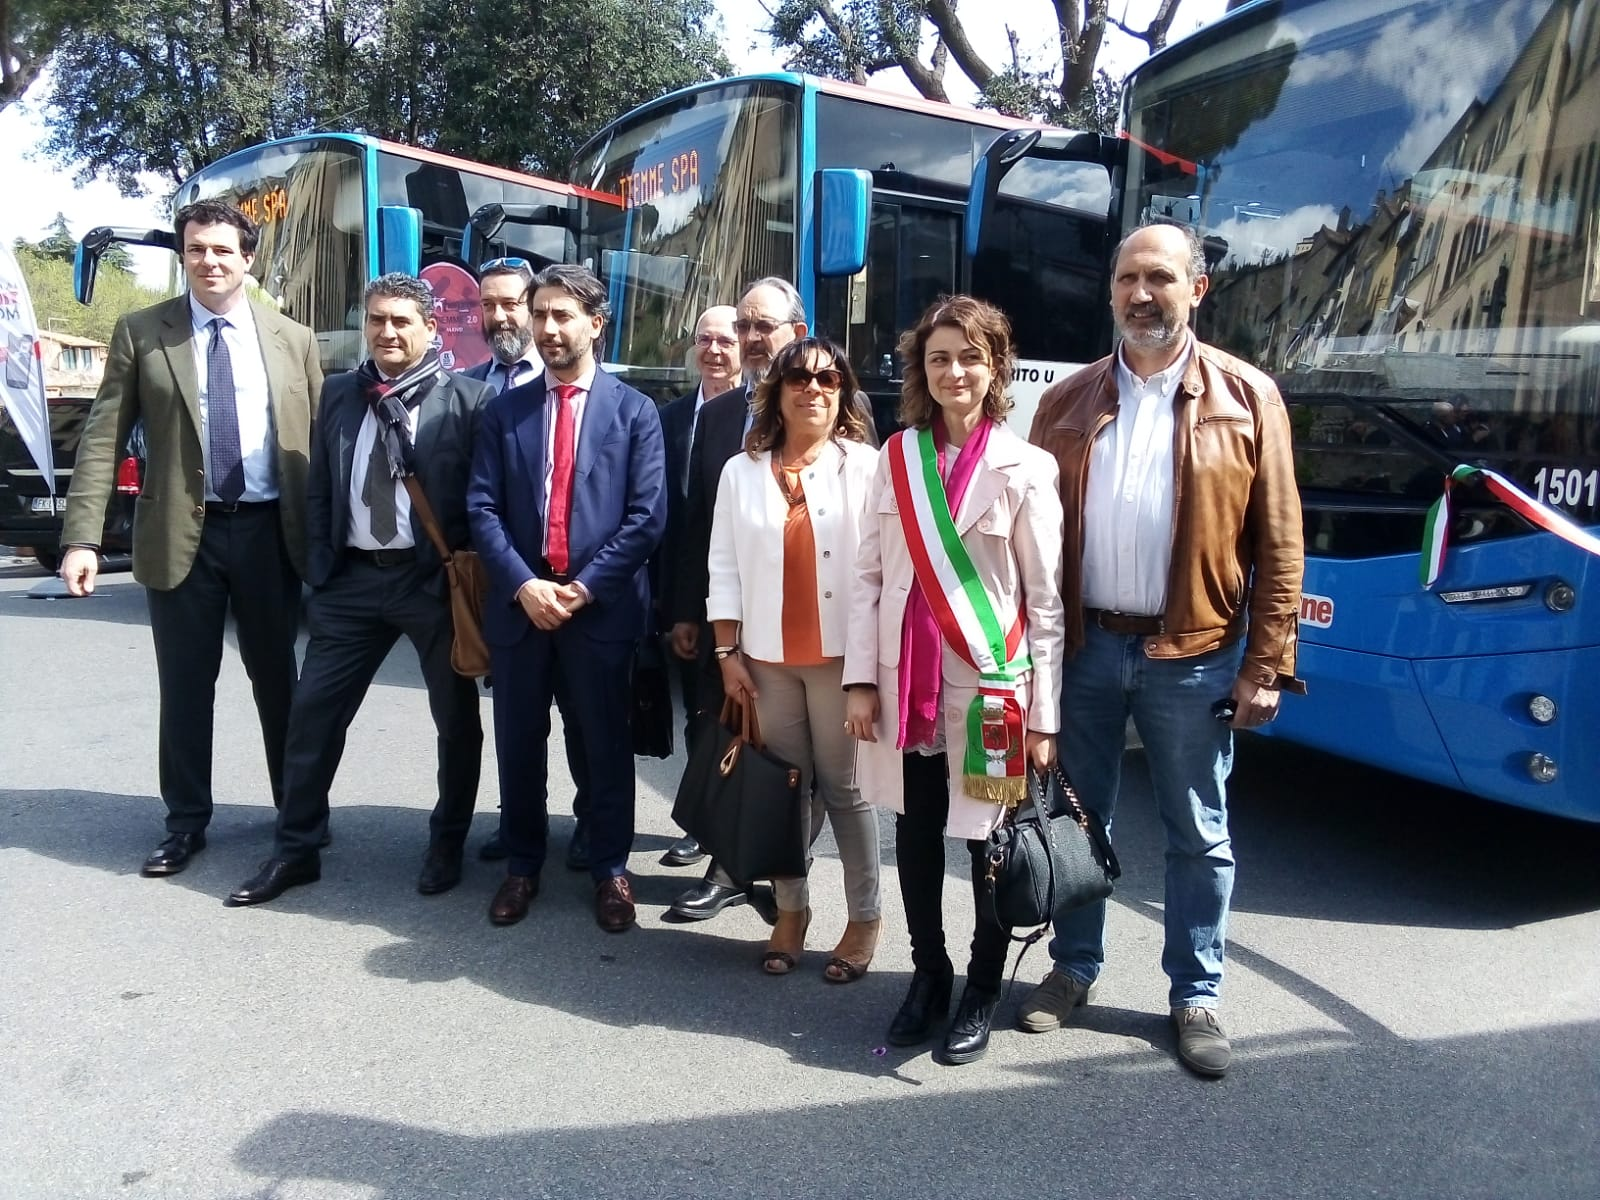 Tiemme inaugura 5 nuovi bus extraurbani